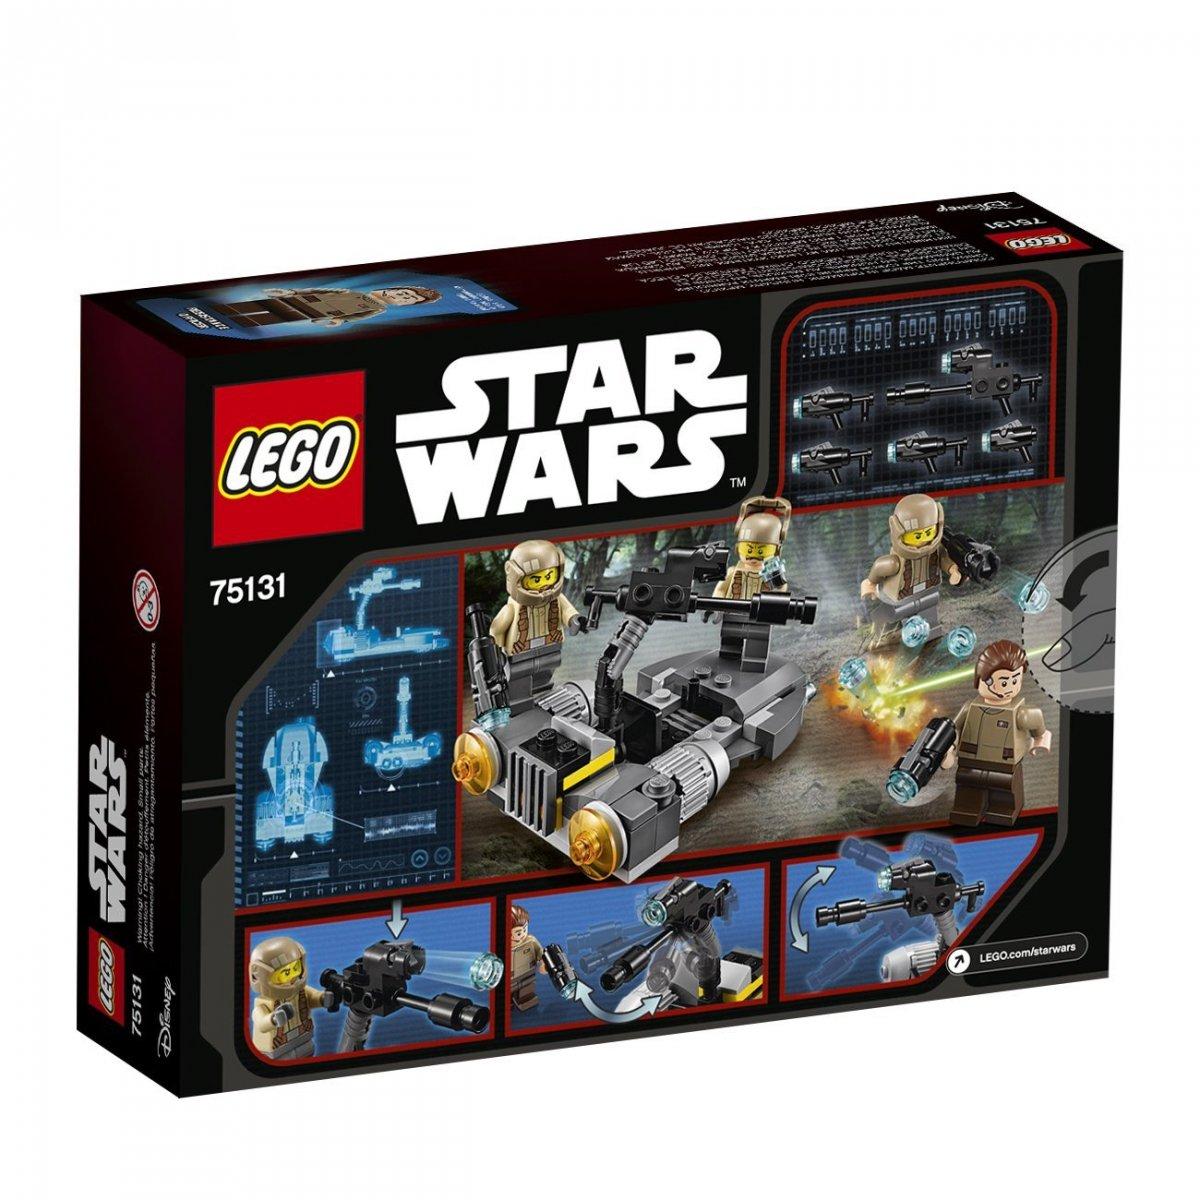 Lego Star Wars 75131 Klocki Ruch Oporu Star Wars Lego Klocki